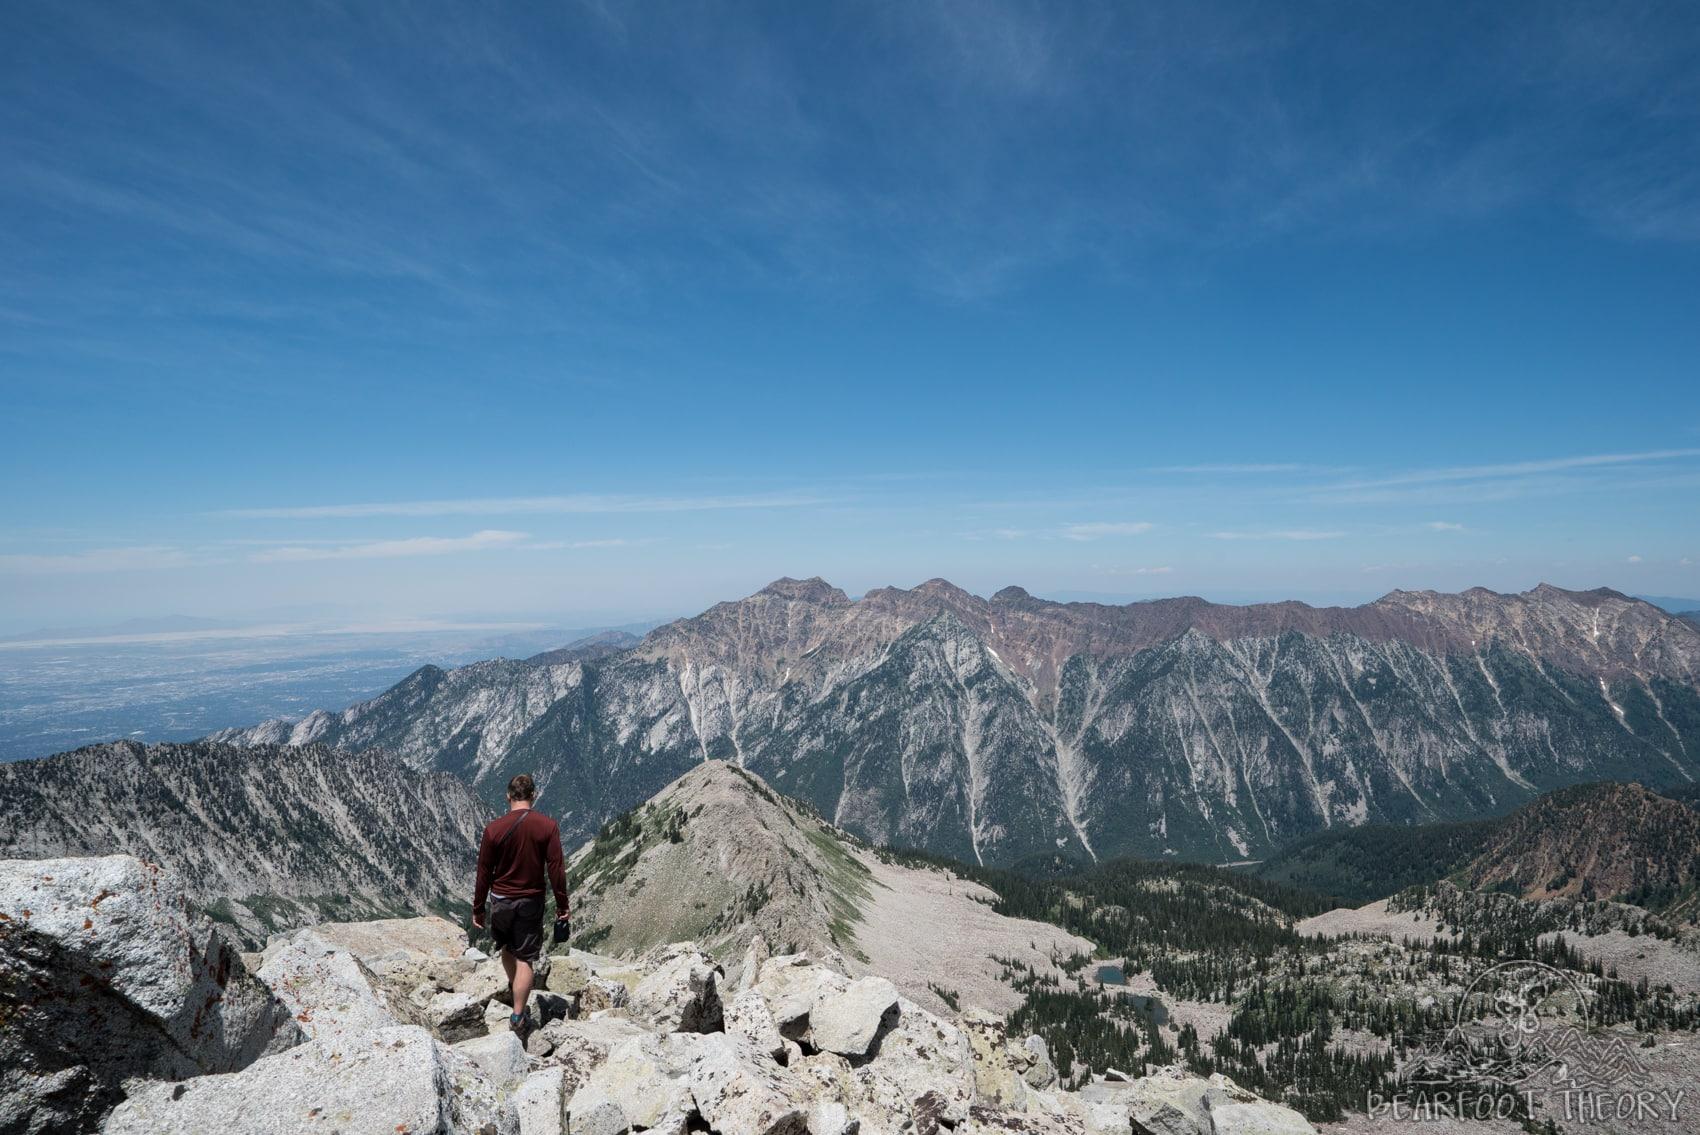 Climbing the Pfeifferhorn, the third tallest peak near Salt Lake City in the Wasatch Mountain Range